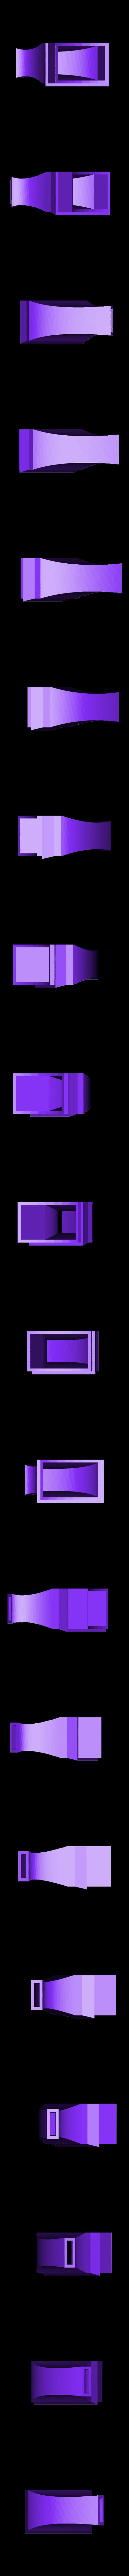 b9MGN9H_for_e3d_v6_fan_1.stl Download free STL file Holder for e3d v6 hotend to MGN9H carrier • Design to 3D print, tigorlab